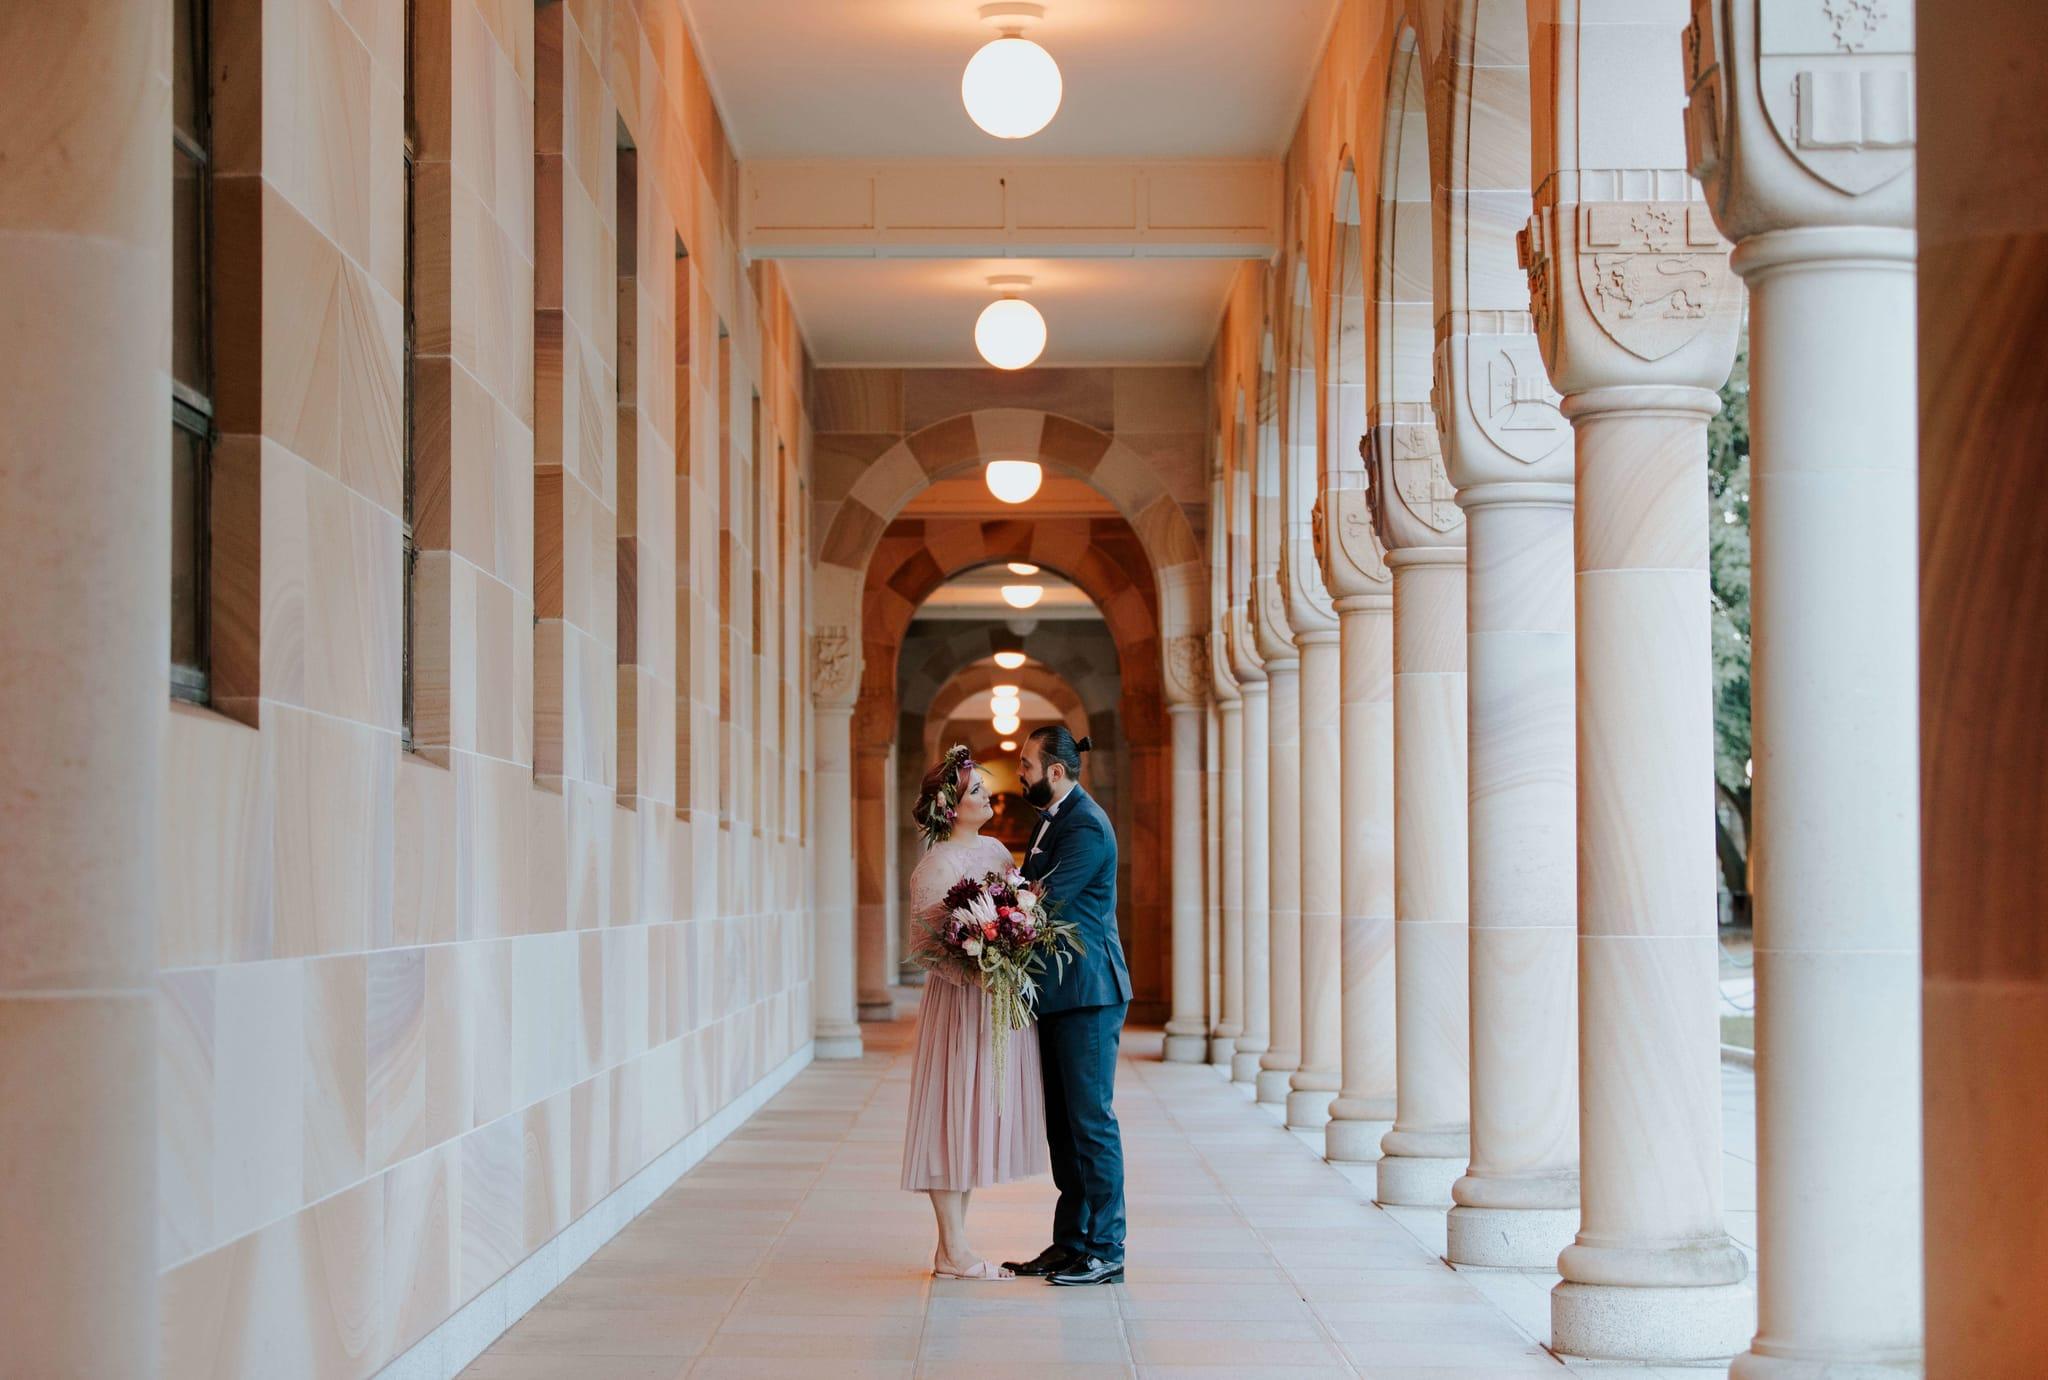 Brisbane-Wedding-Photographer-Natalie-Skoric-21.jpg